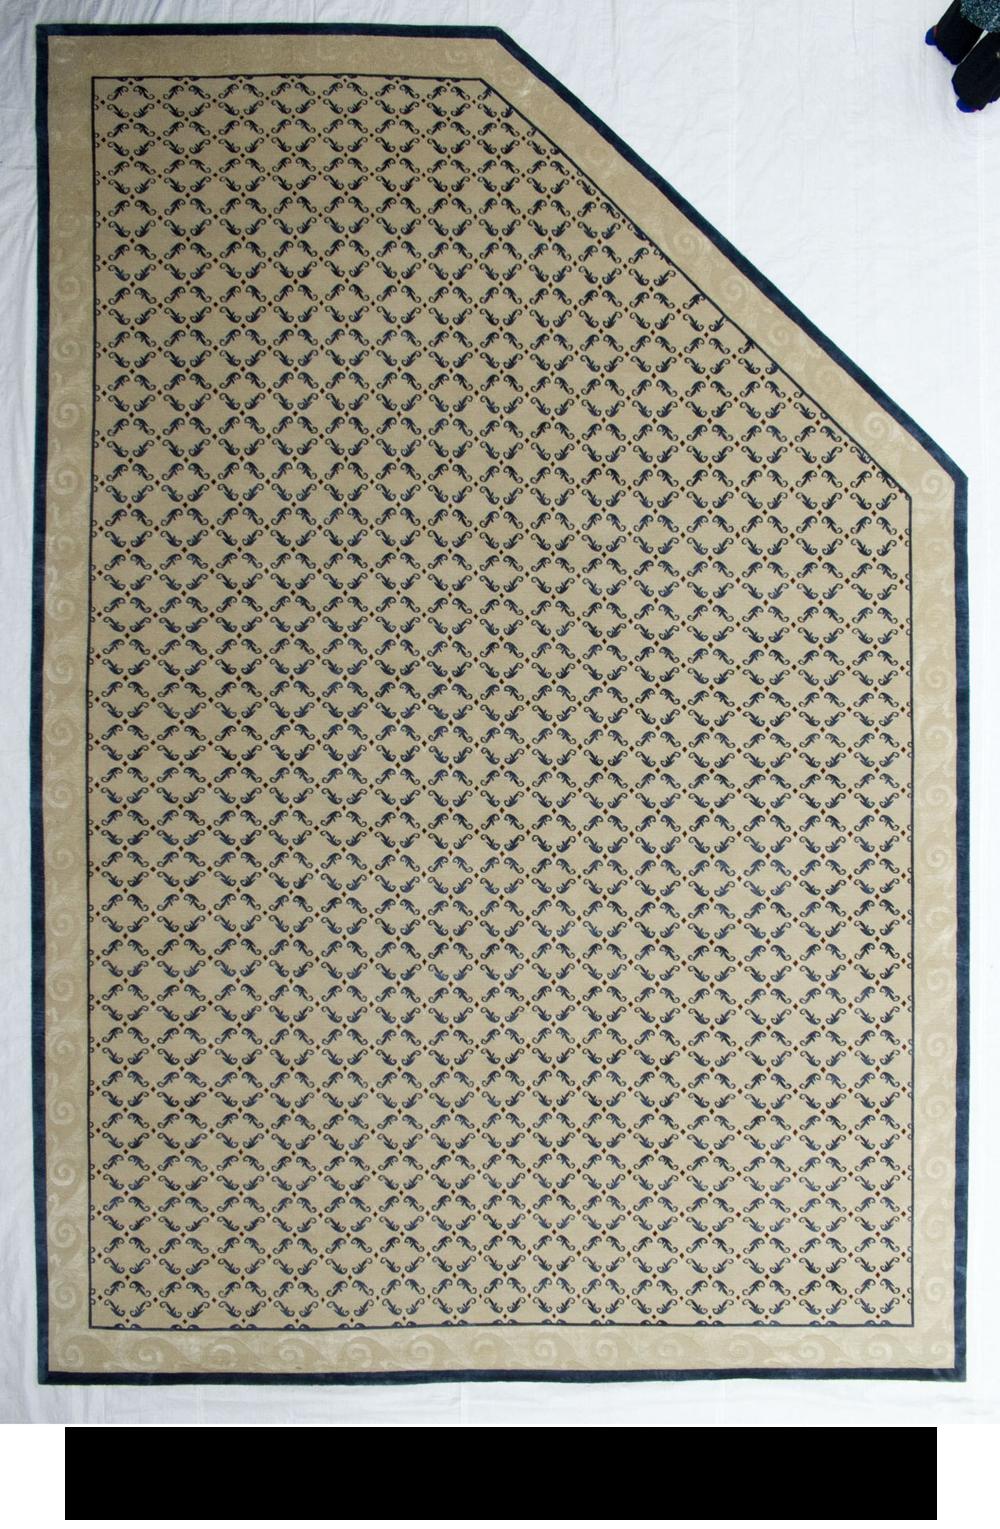 BRAD-23824 DB (9407 Shaped) 12-83 x 18-83.png